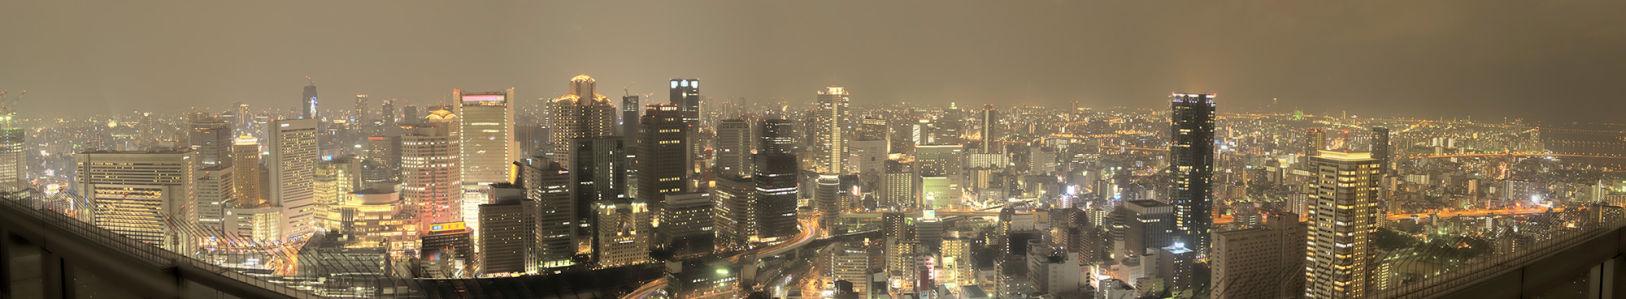 Фотообои панорама осаки япония ночная (city-0000045)